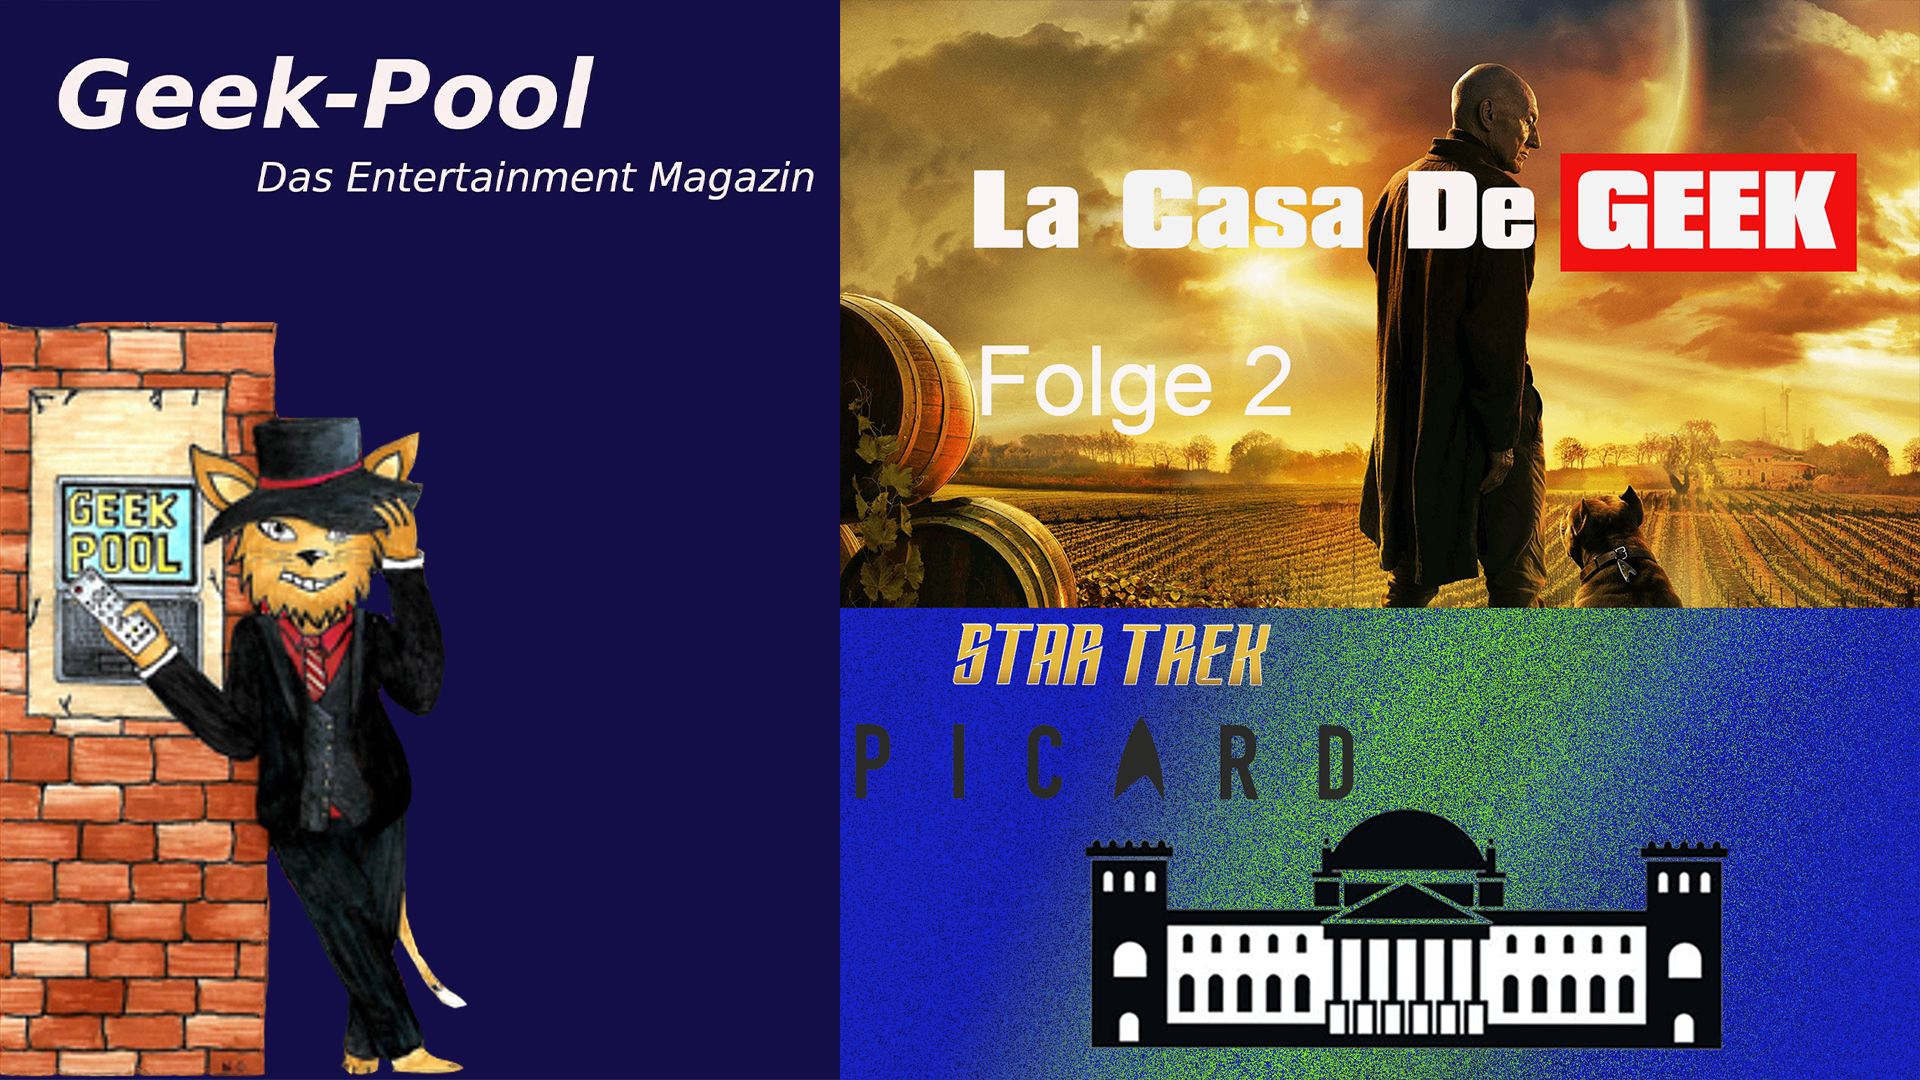 La Casa de Geek: Star Trek Picard